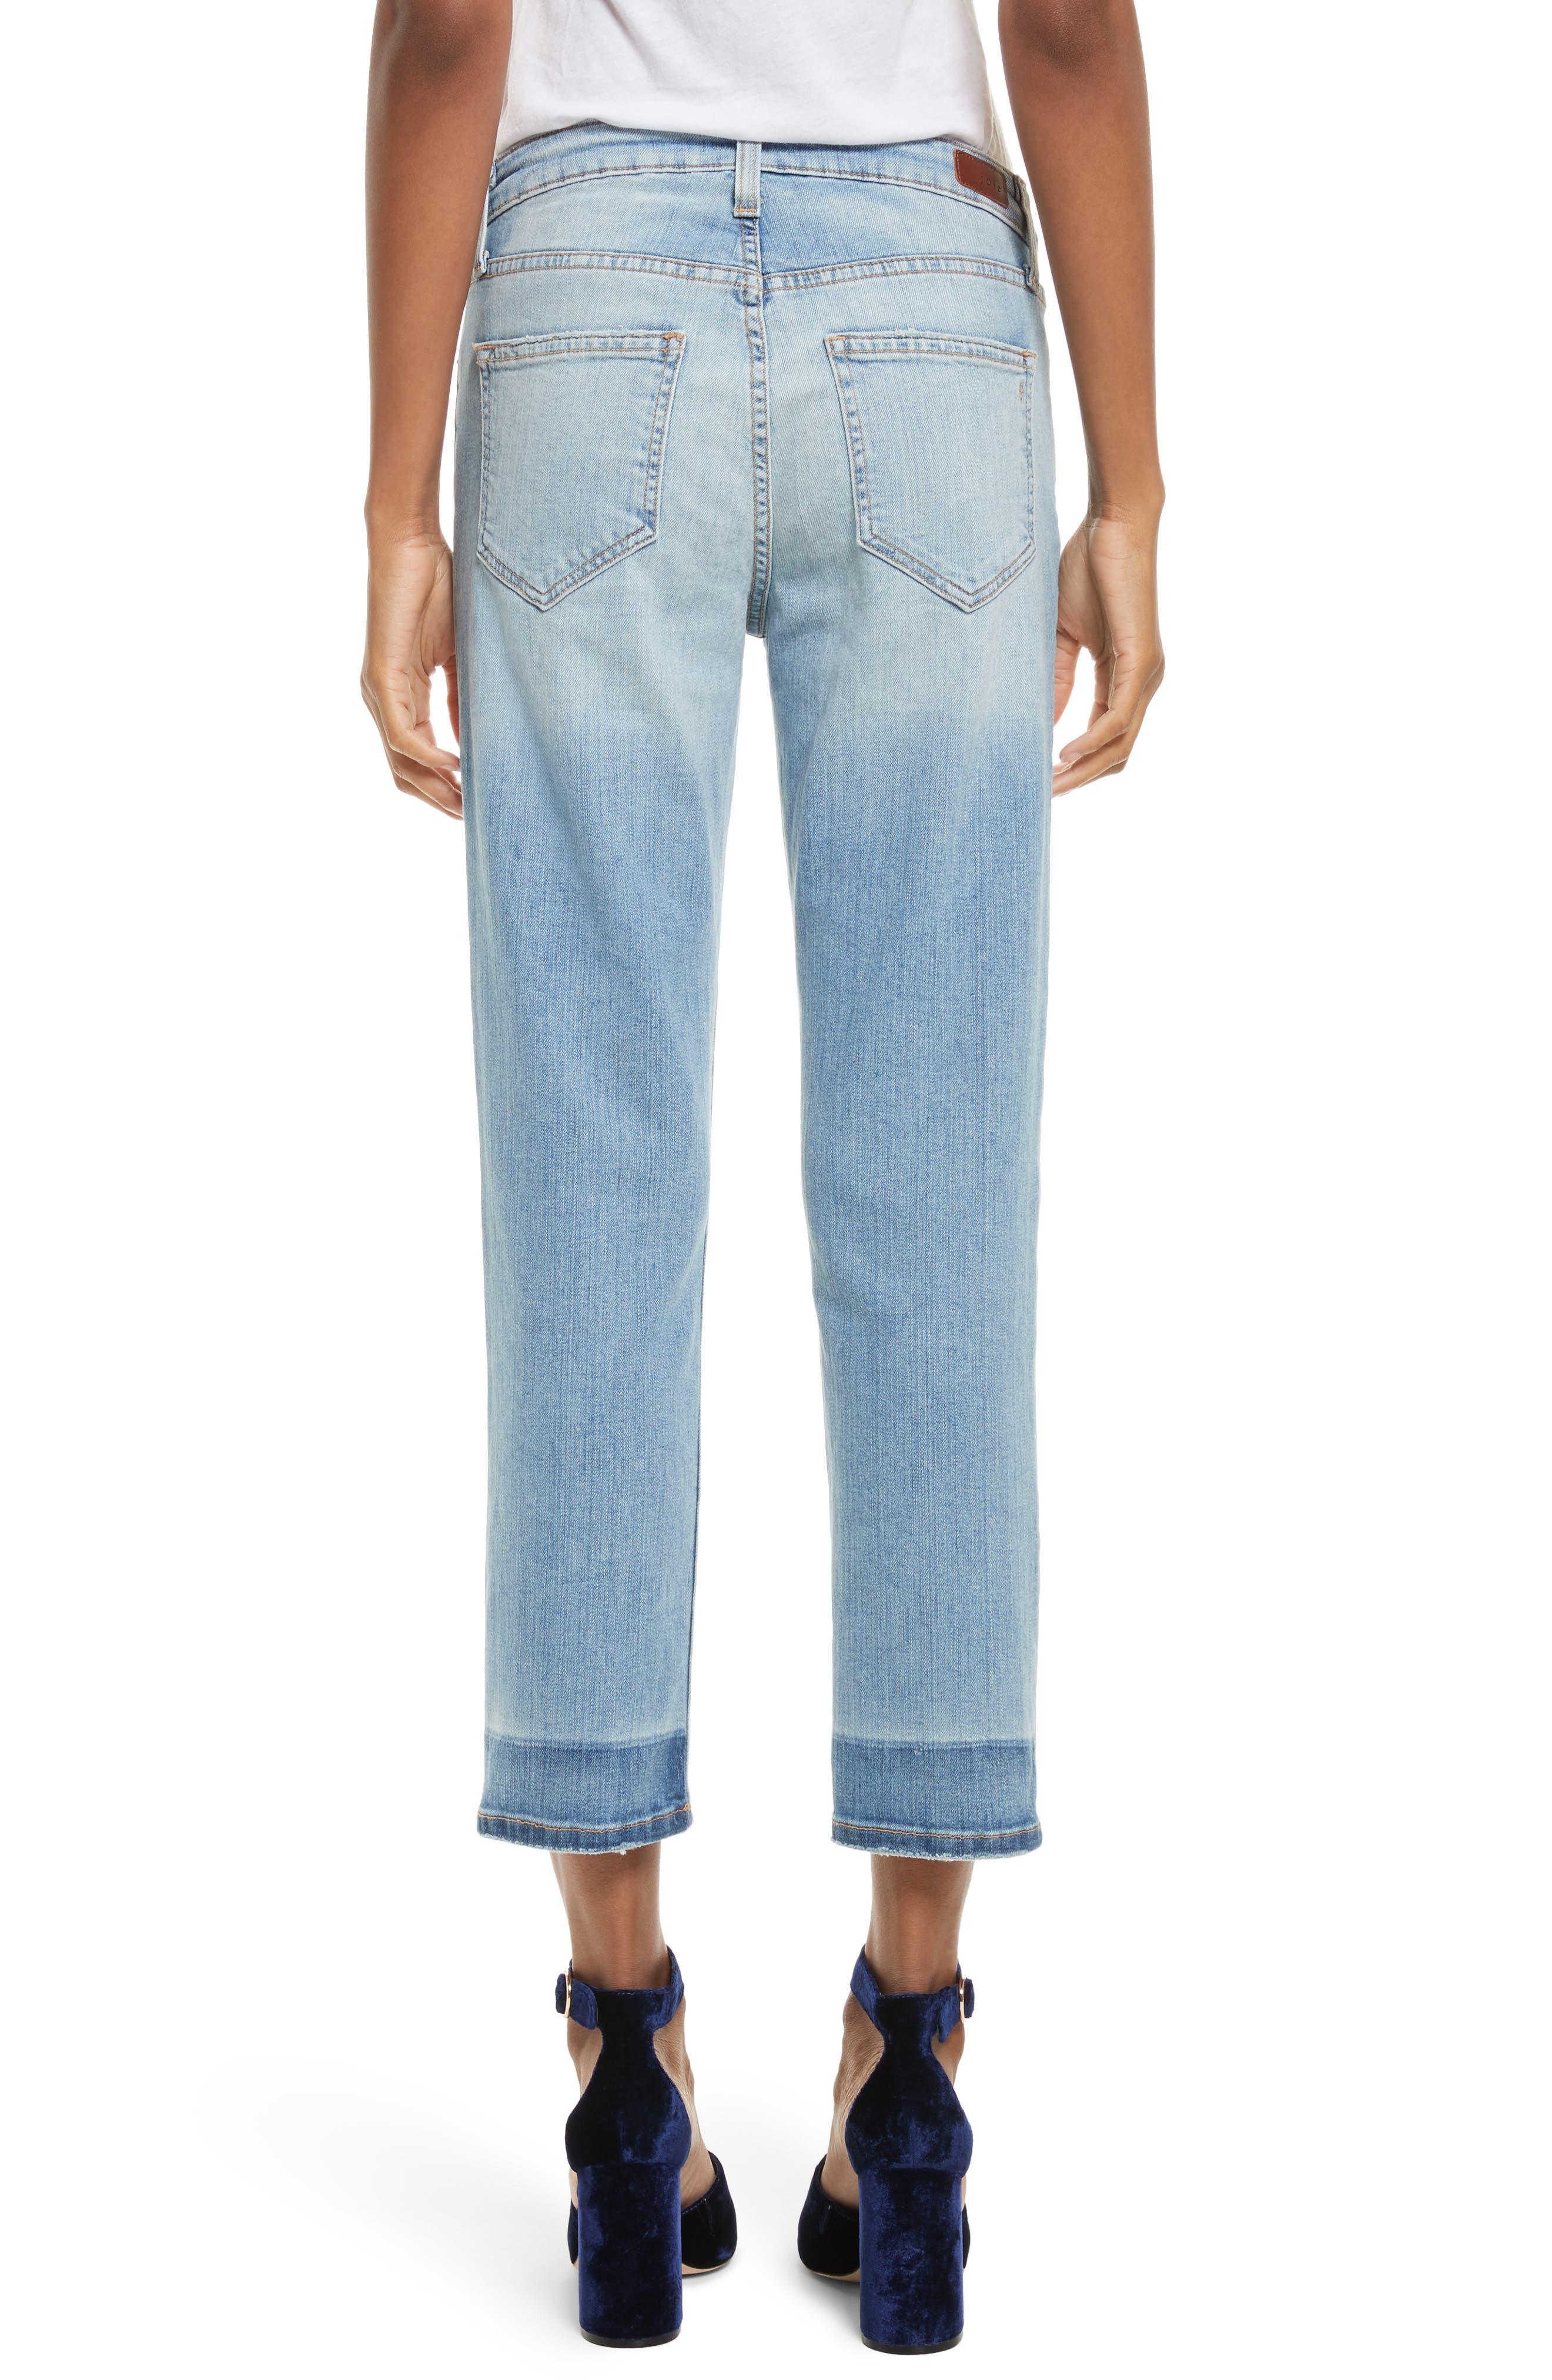 Josalind Straight Leg Crop Jeans,                             Alternate thumbnail 2, color,                             479